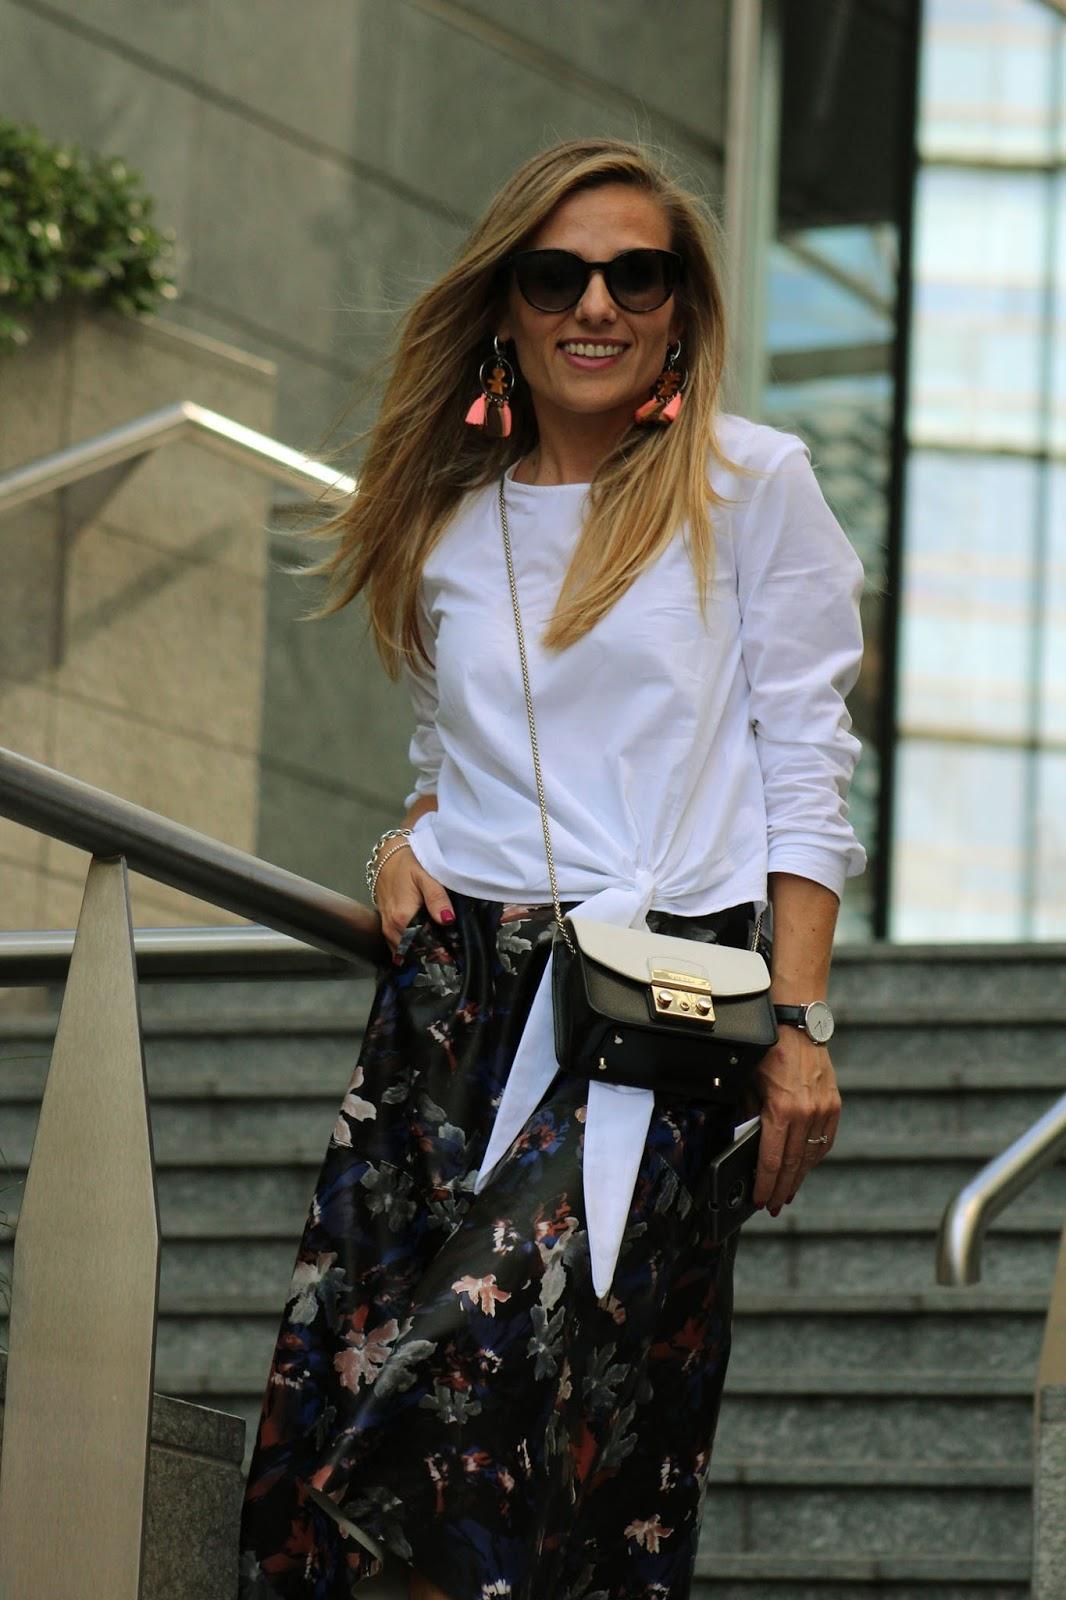 Eniwhere Fashion - Milano Fashion Week - Outfit